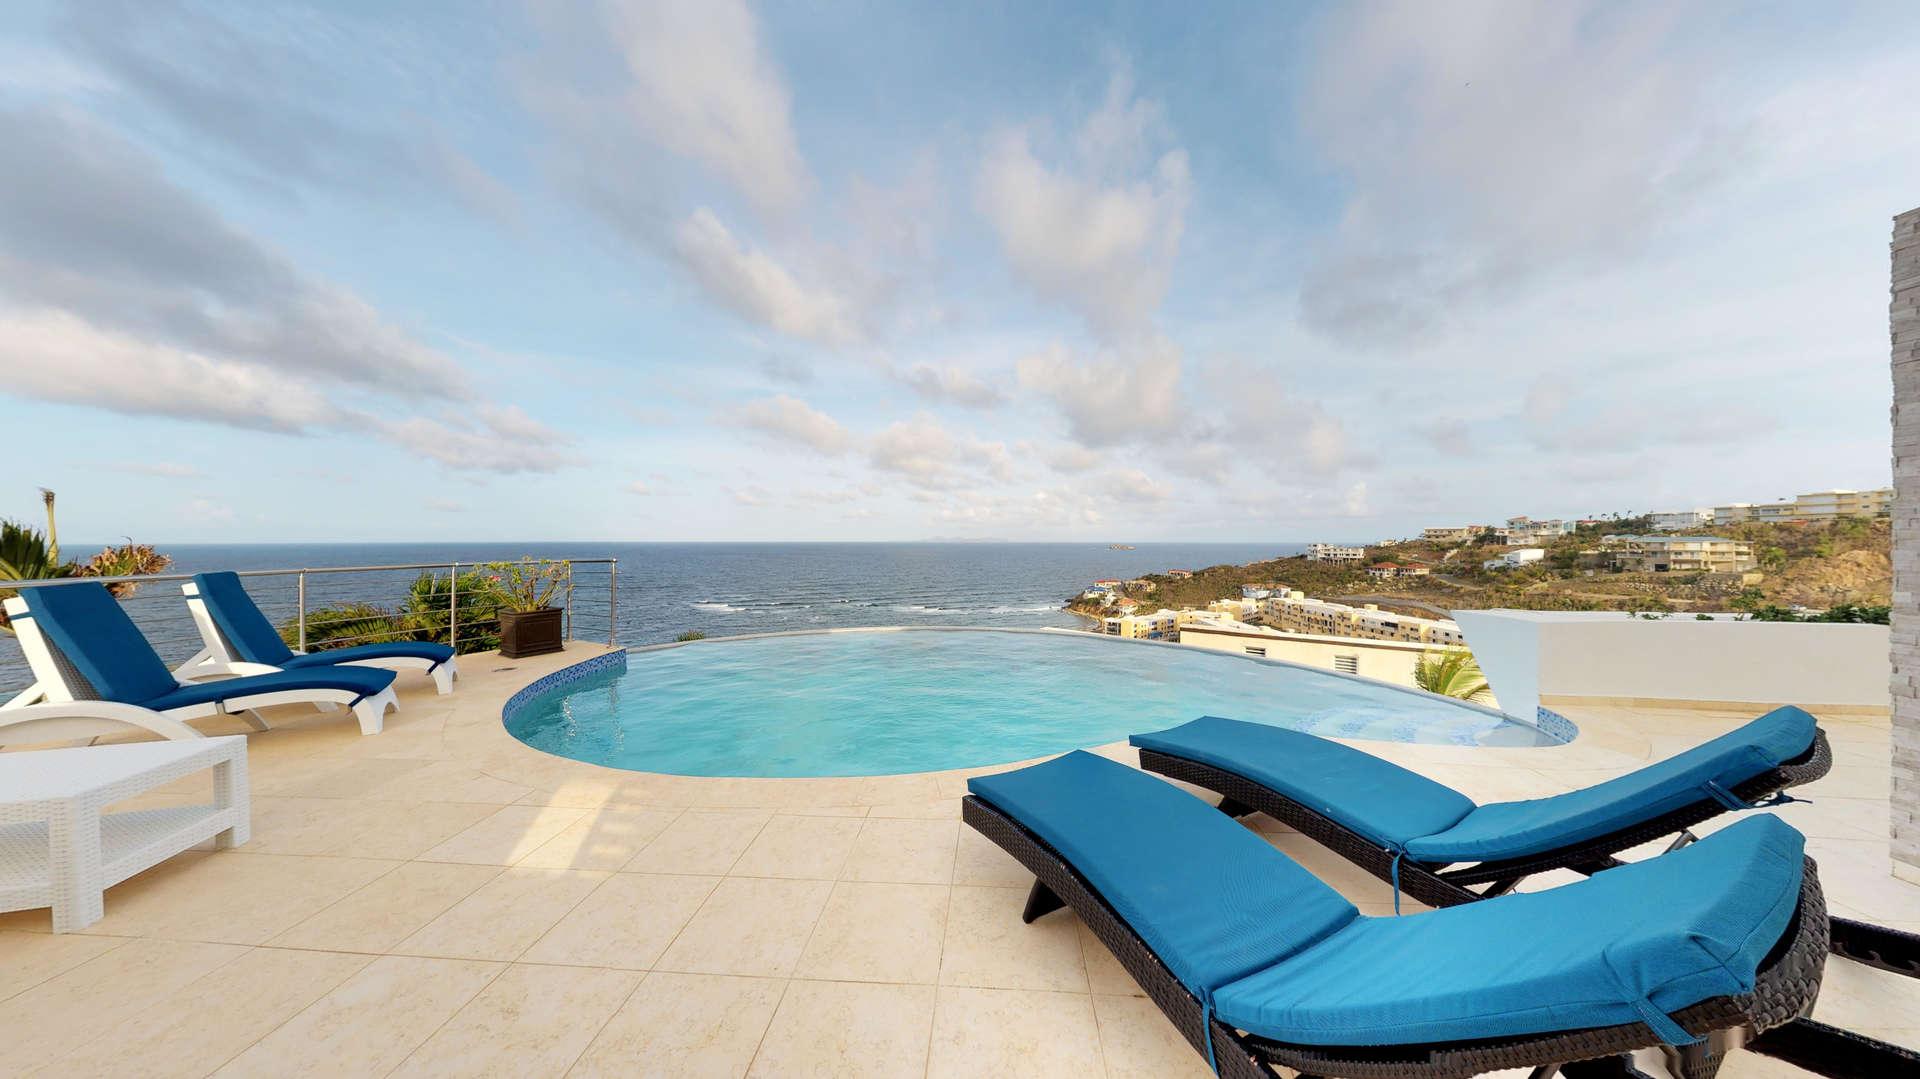 Luxury villa rentals caribbean - St martin - Sint maarten - Oyster pond - Summerwinds - Image 1/22